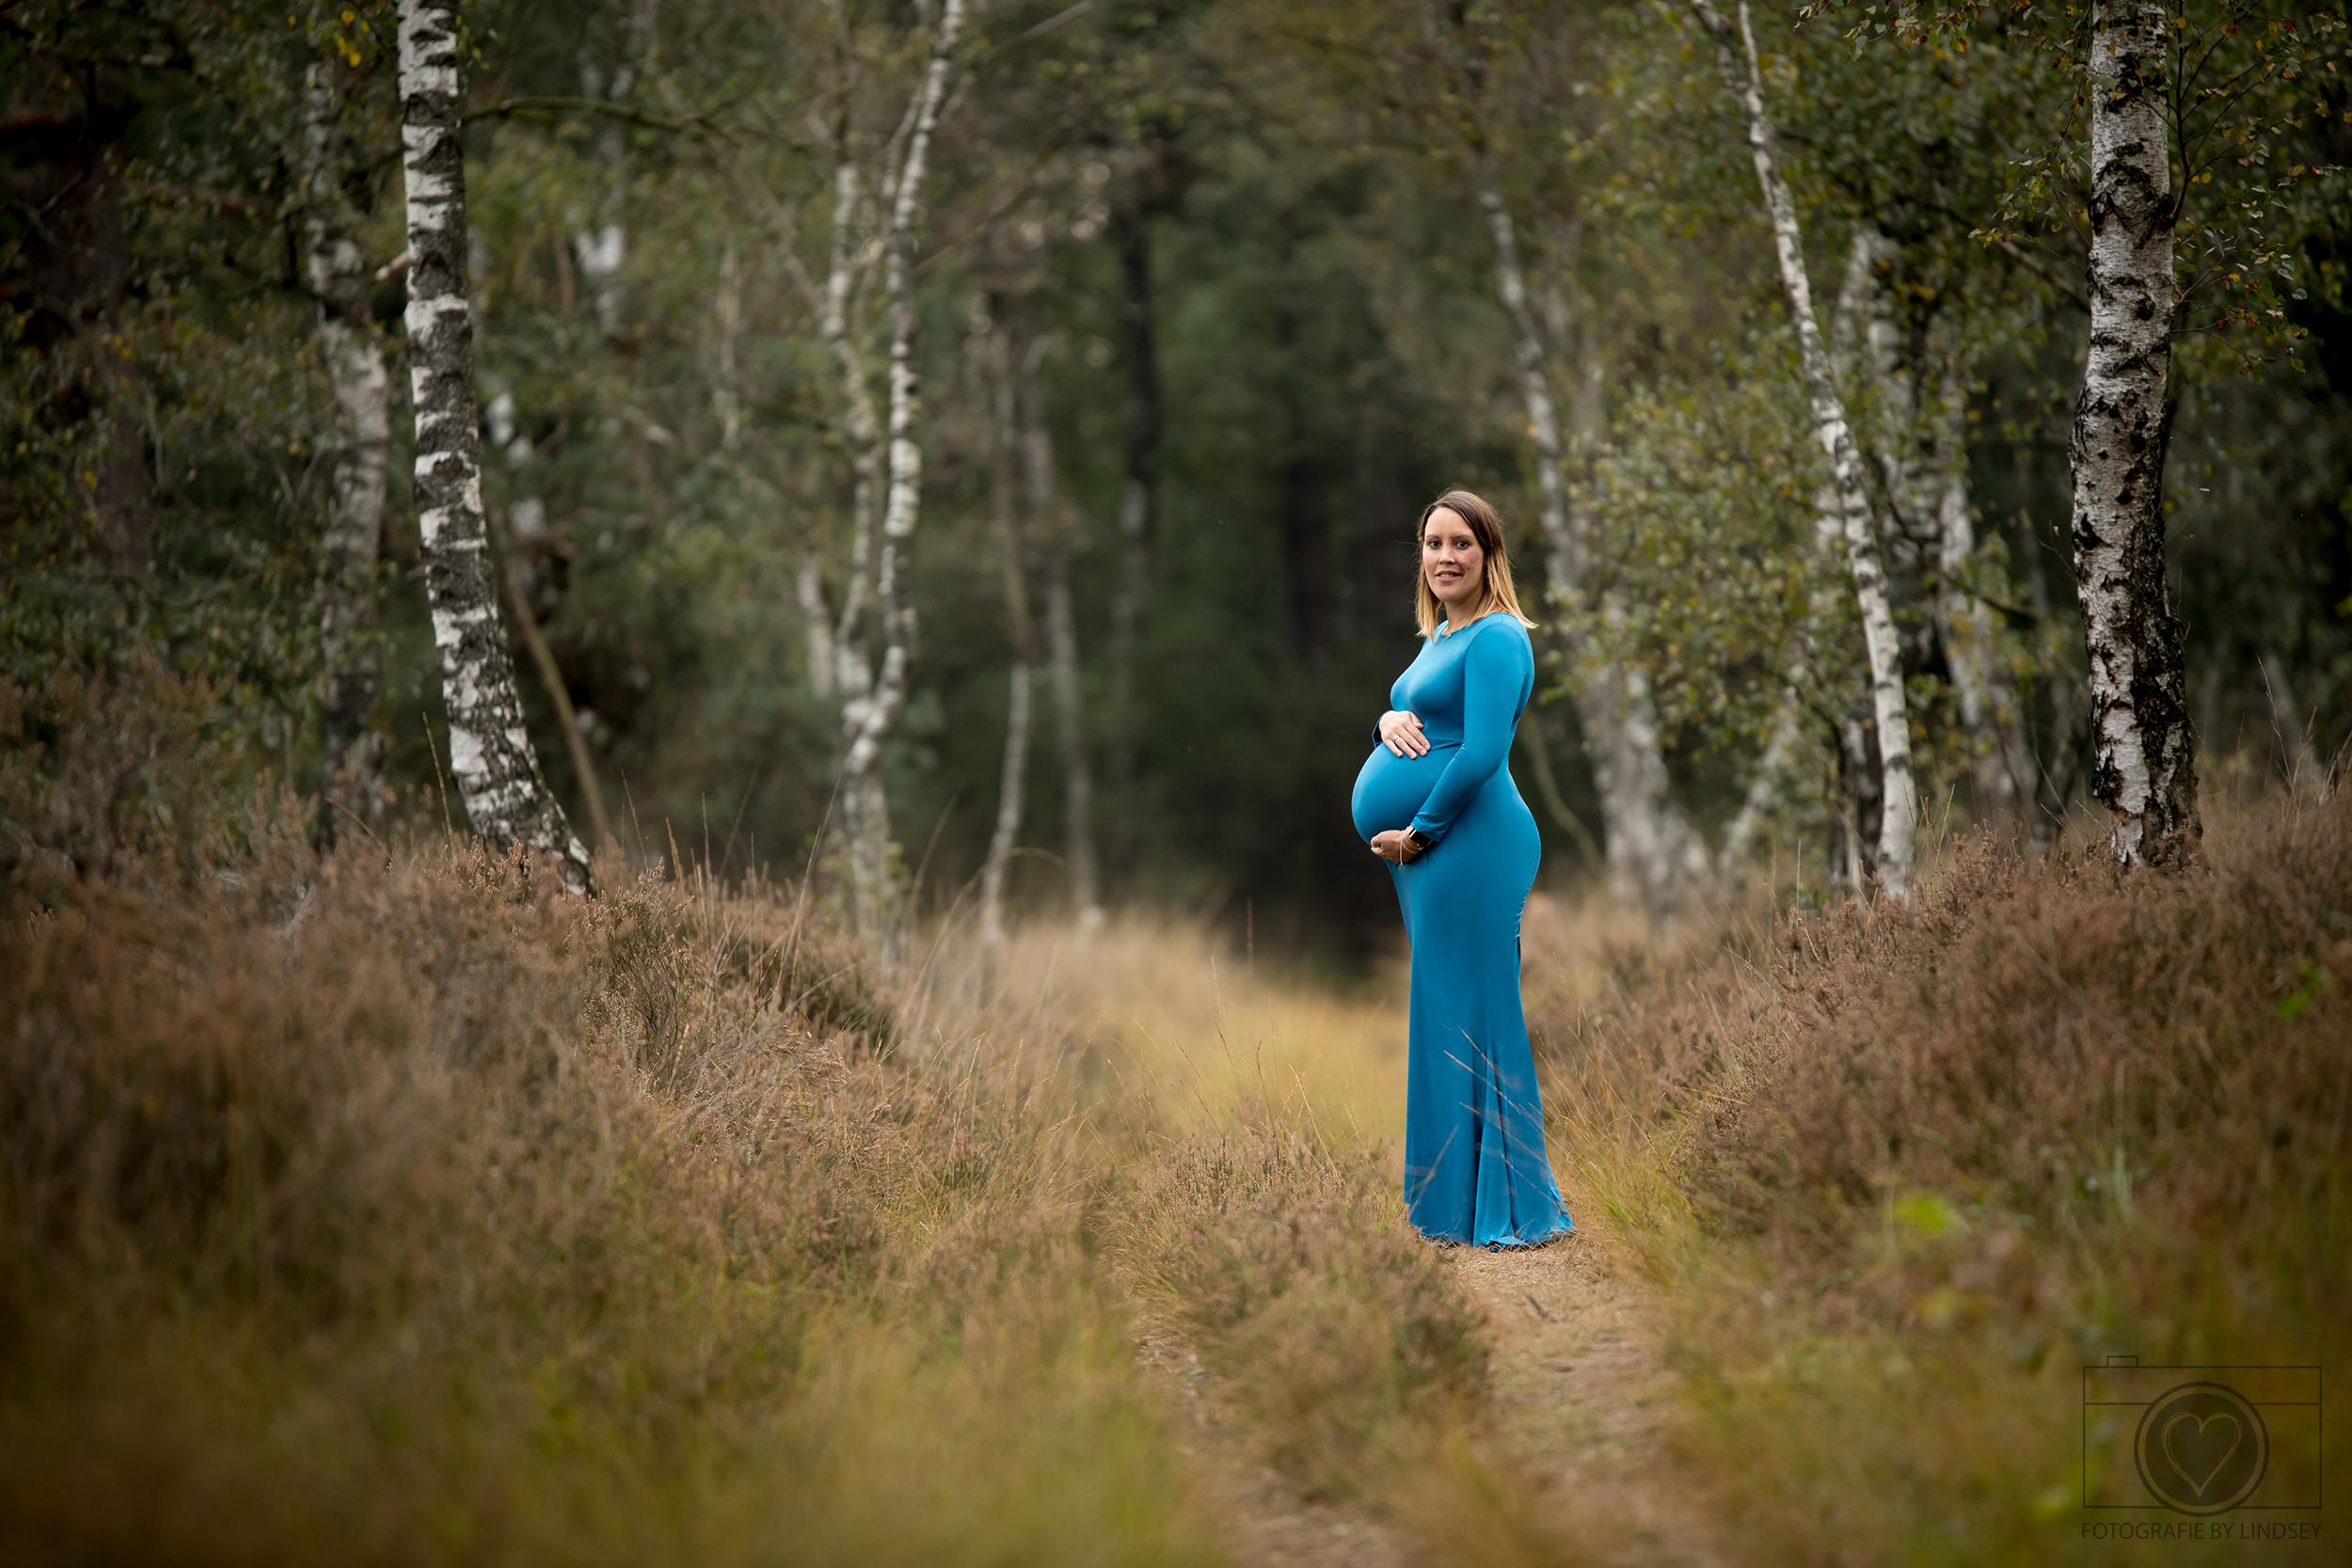 zwangerschapsfotografie by Lindsey